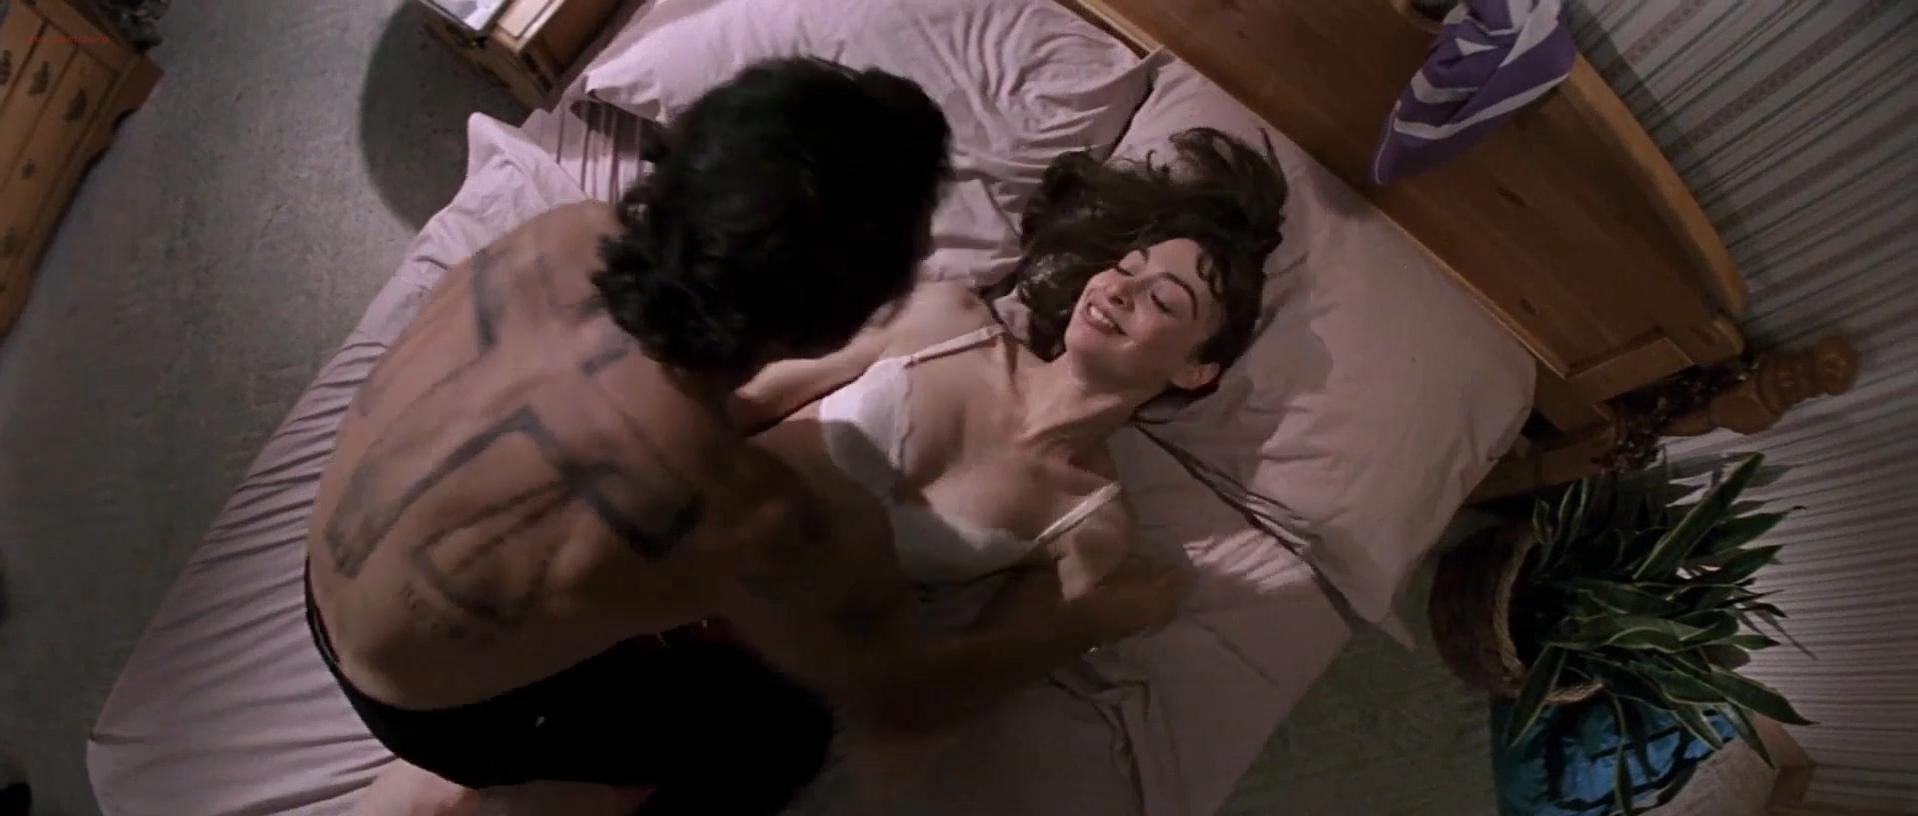 big butt pantyhose porn